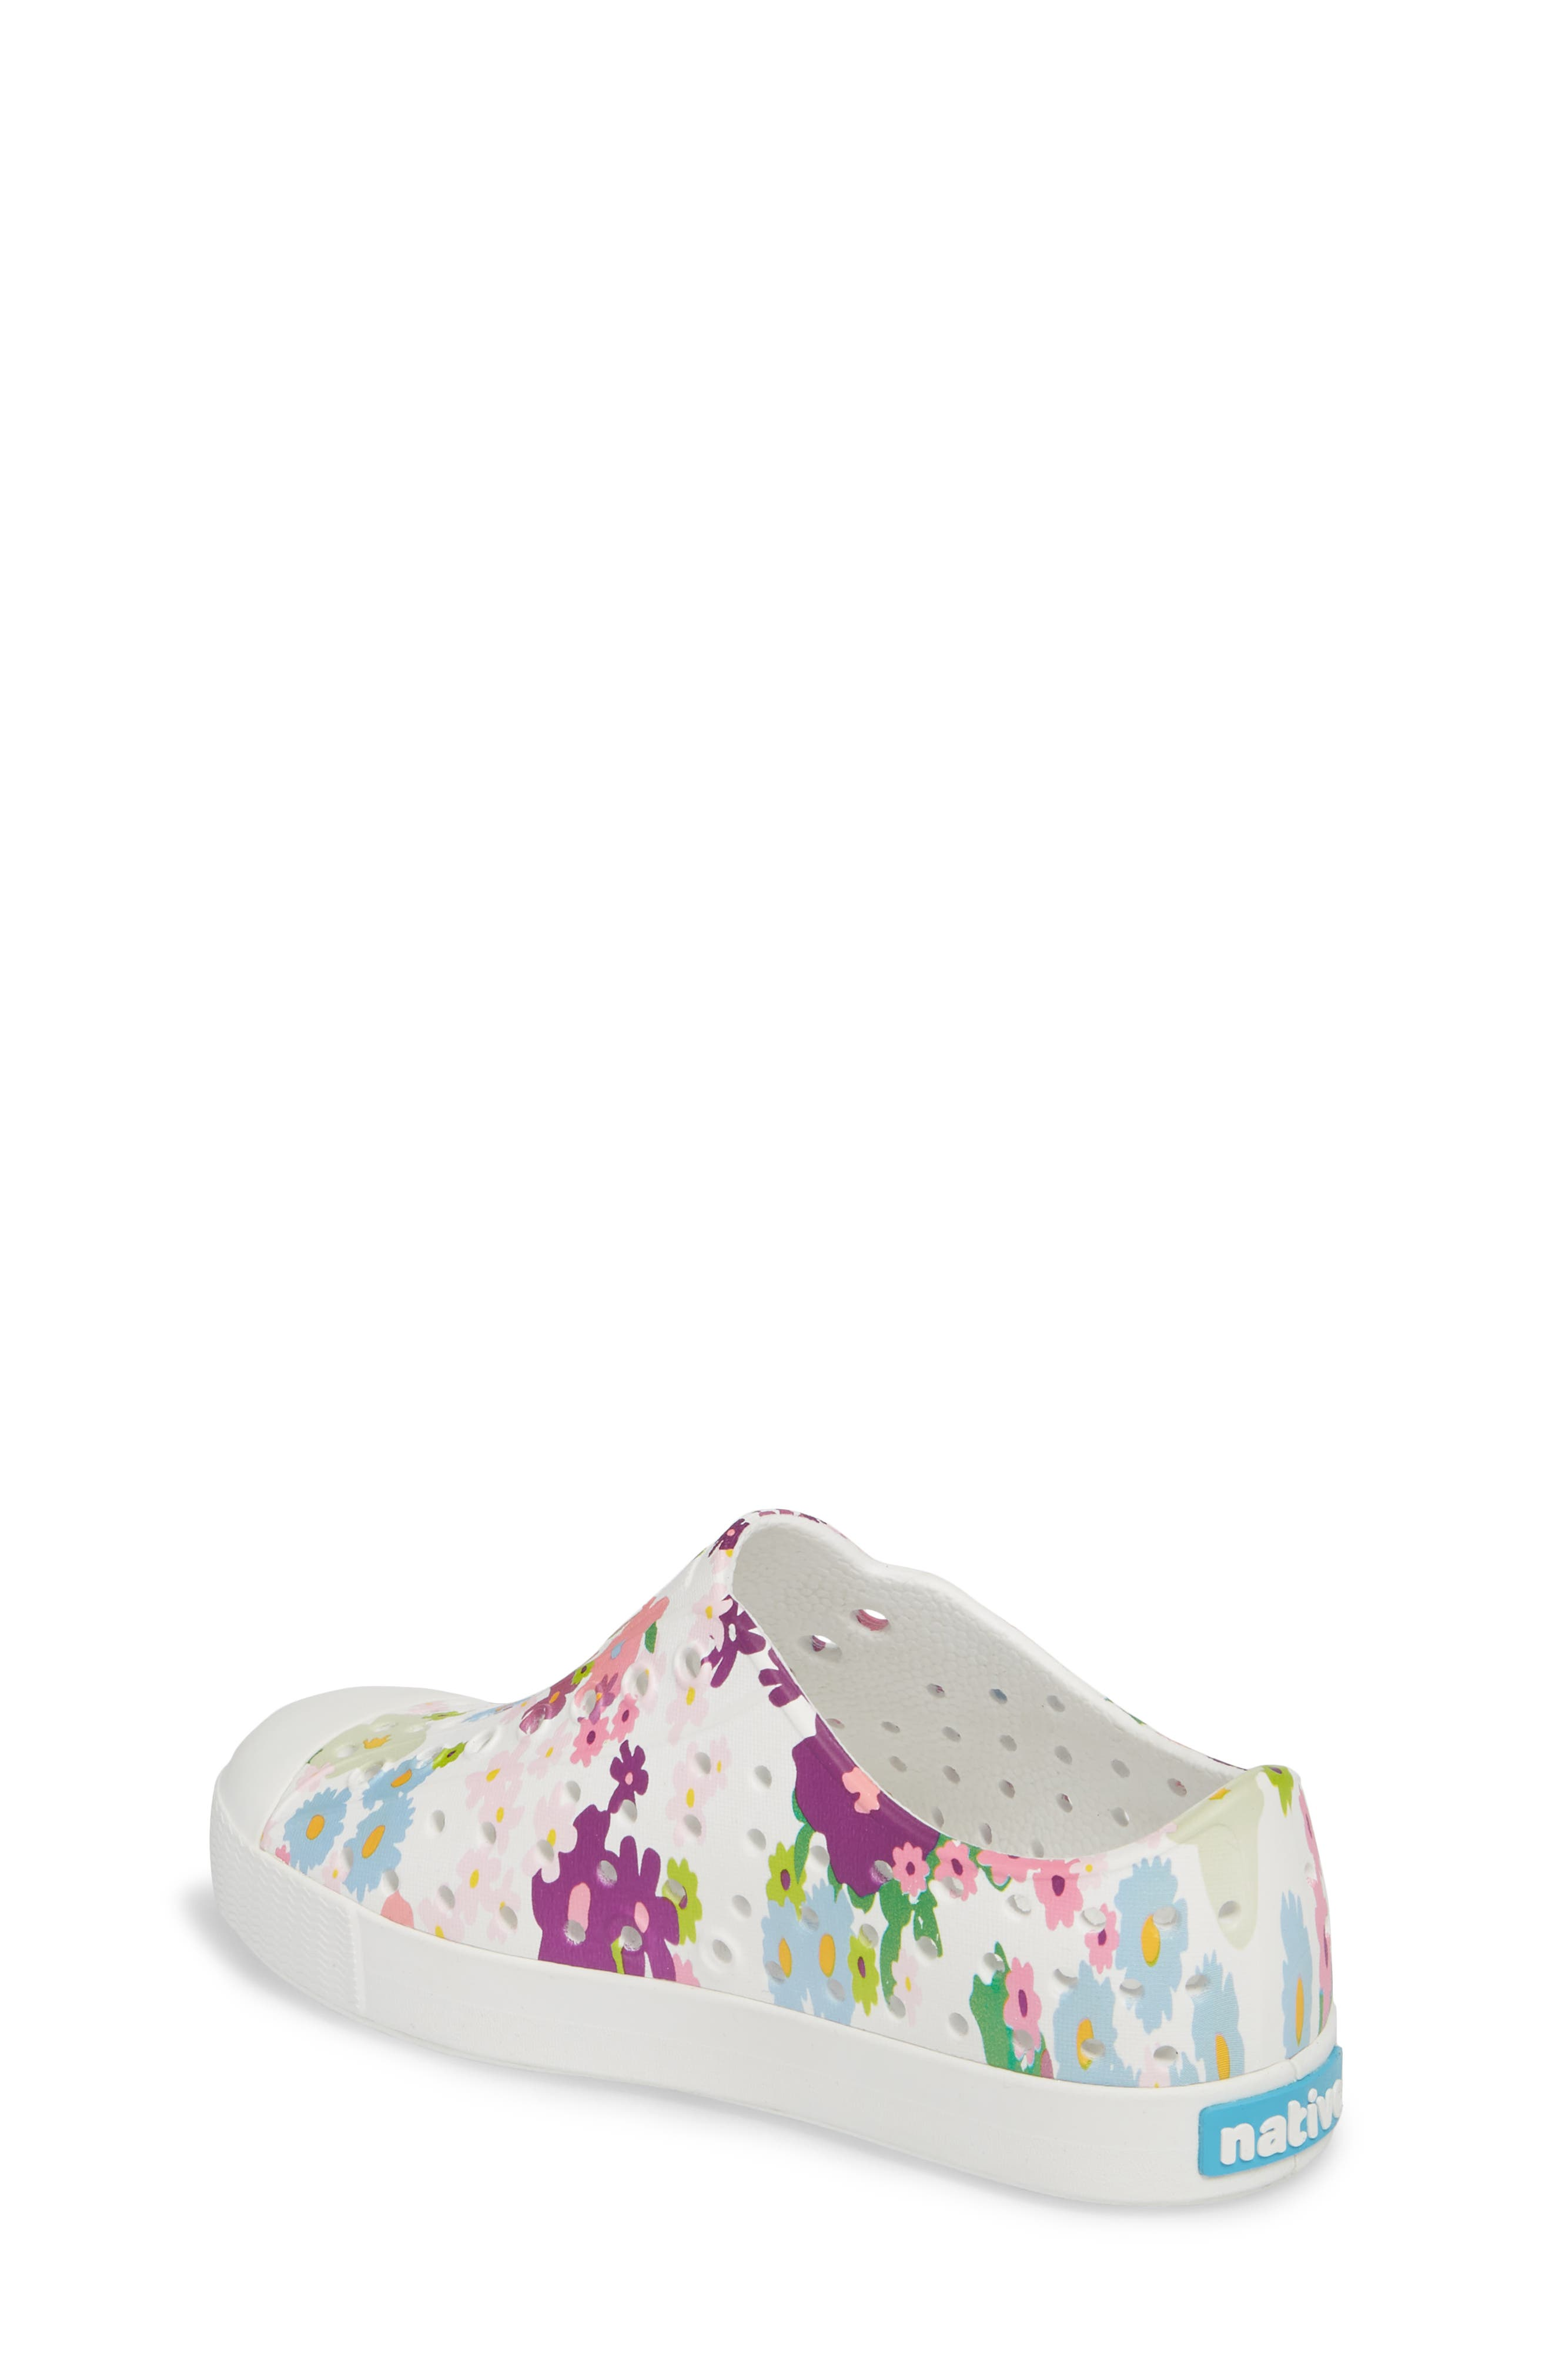 NATIVE SHOES, Jefferson Quartz Slip-On Vegan Sneaker, Alternate thumbnail 2, color, SHELL WHITE/ DAISY PRINT